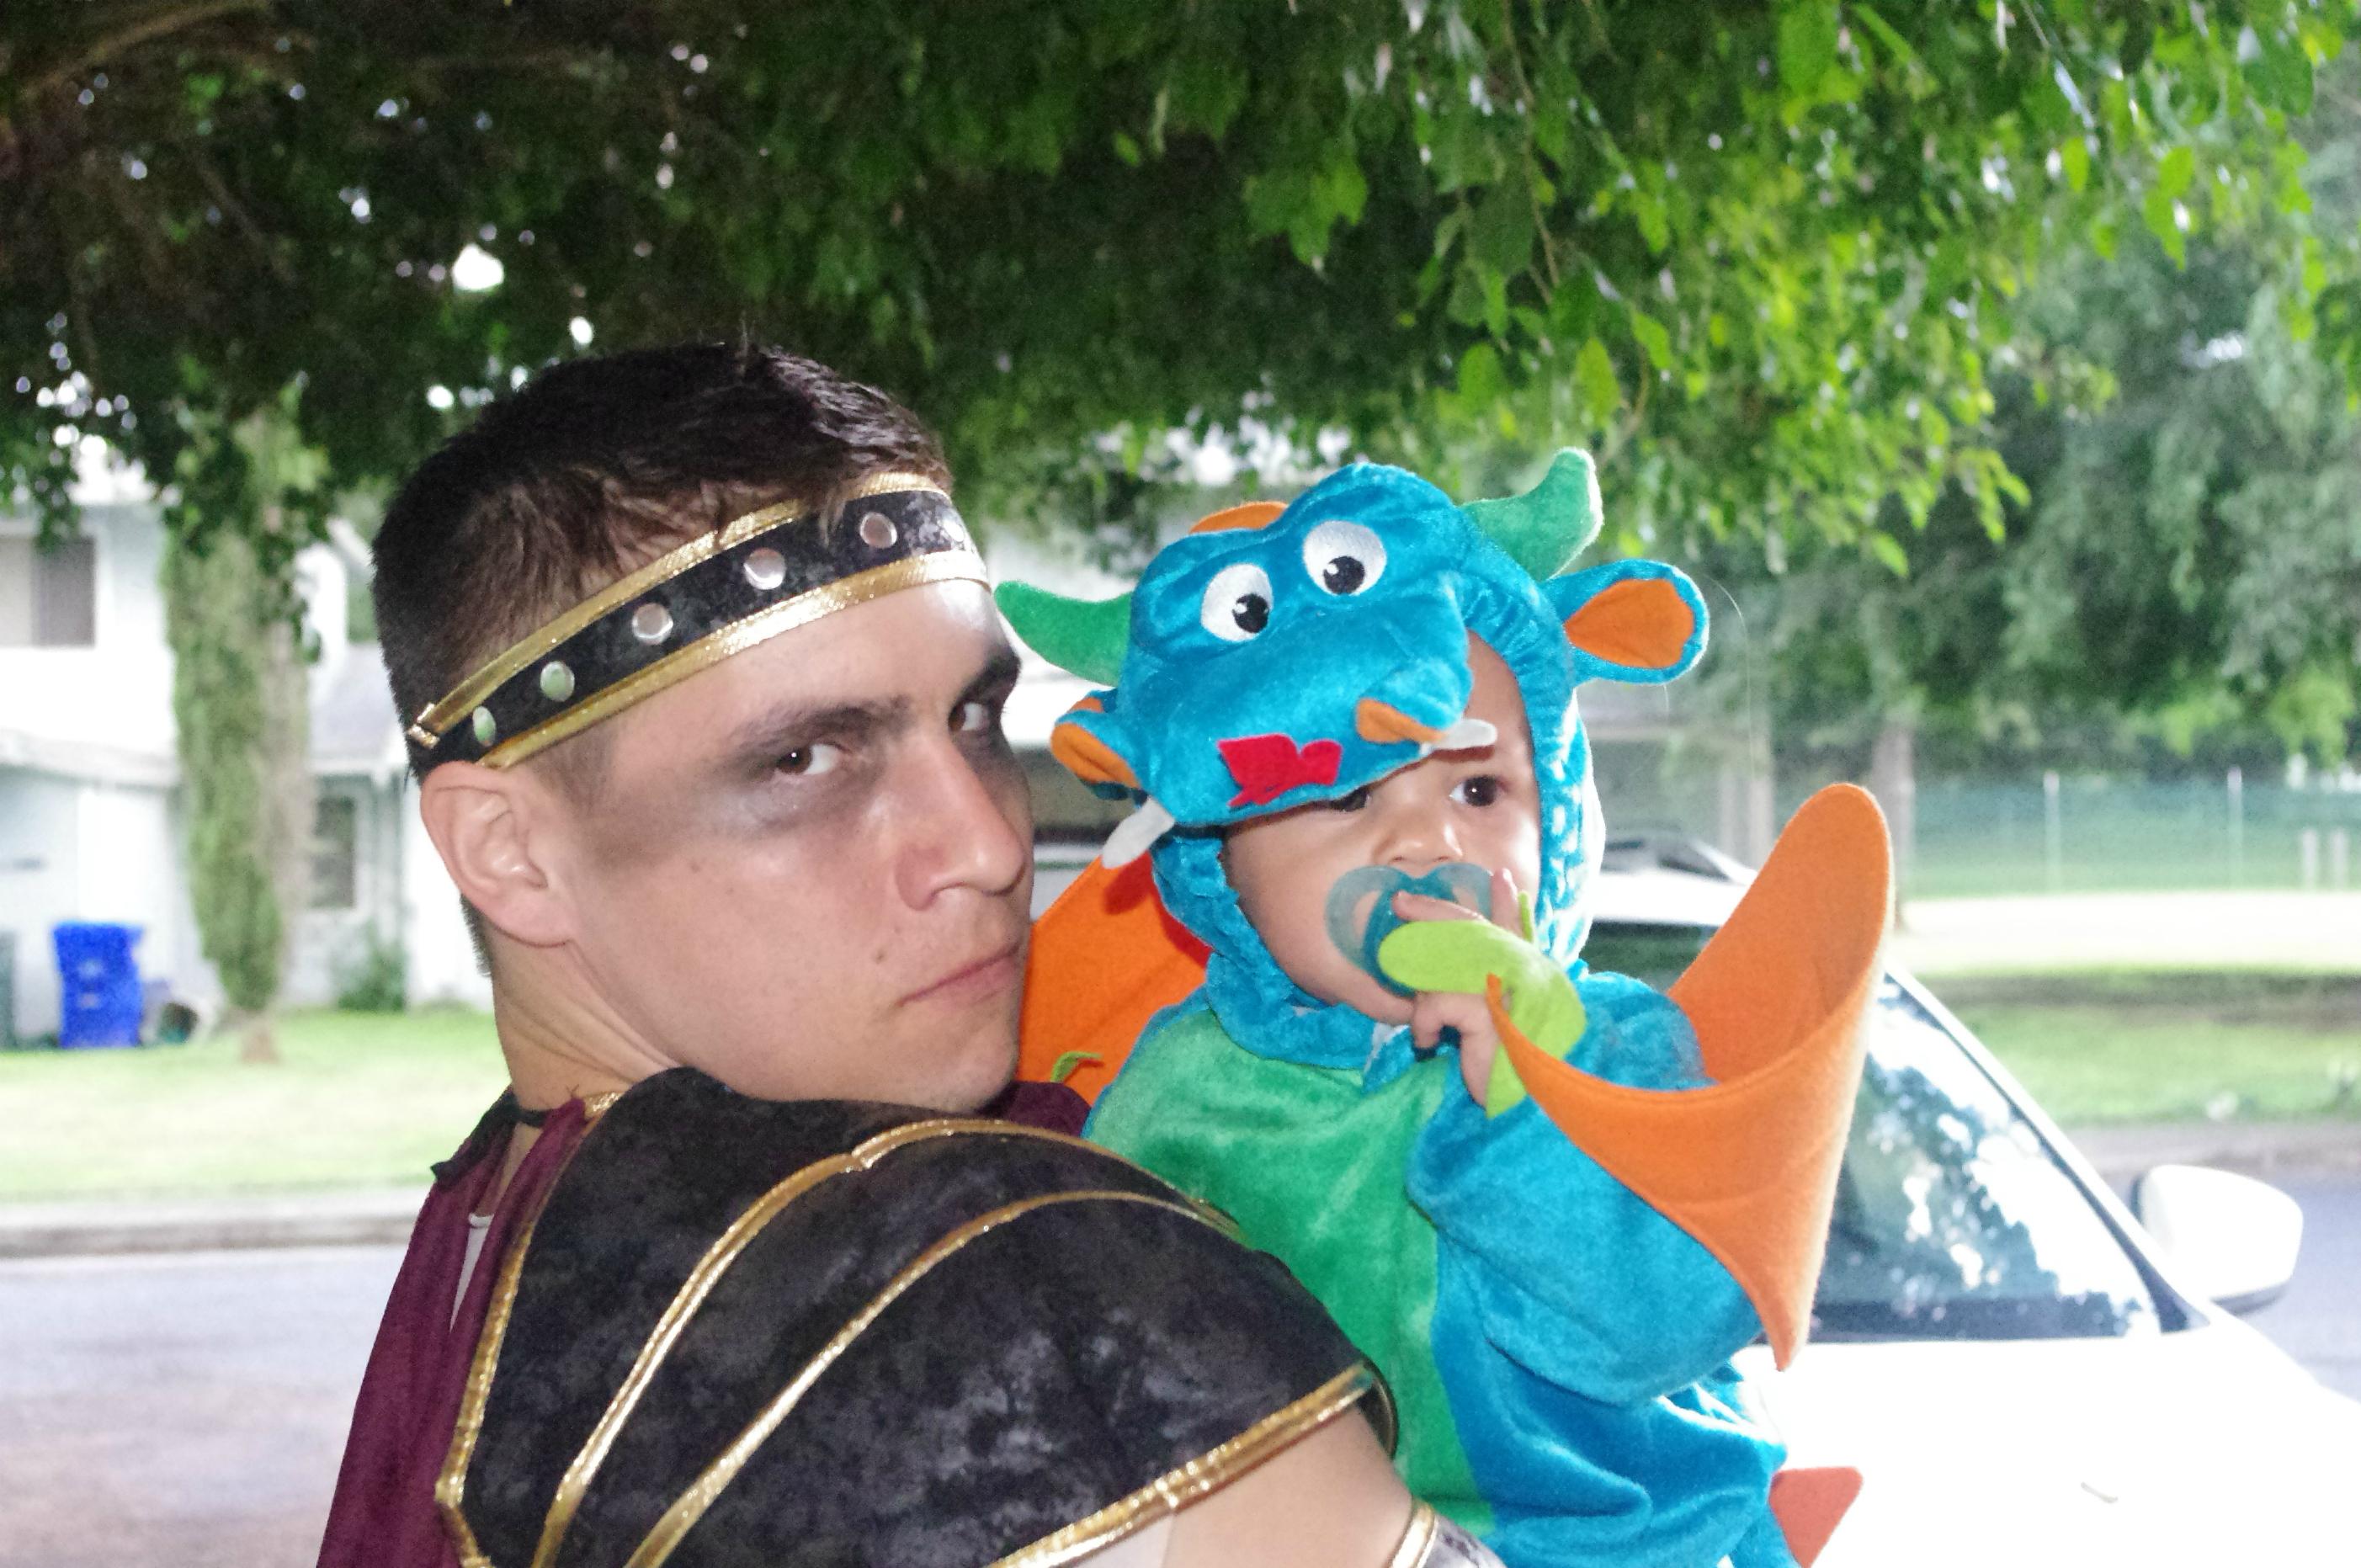 Halloween in Hawaii 2014 - baby dragon costume - Pumpkins - Costumes - 300 - Spartan  sc 1 st  Jasmin Please & Happy Halloween Hawaii u2013 Jasmin Please